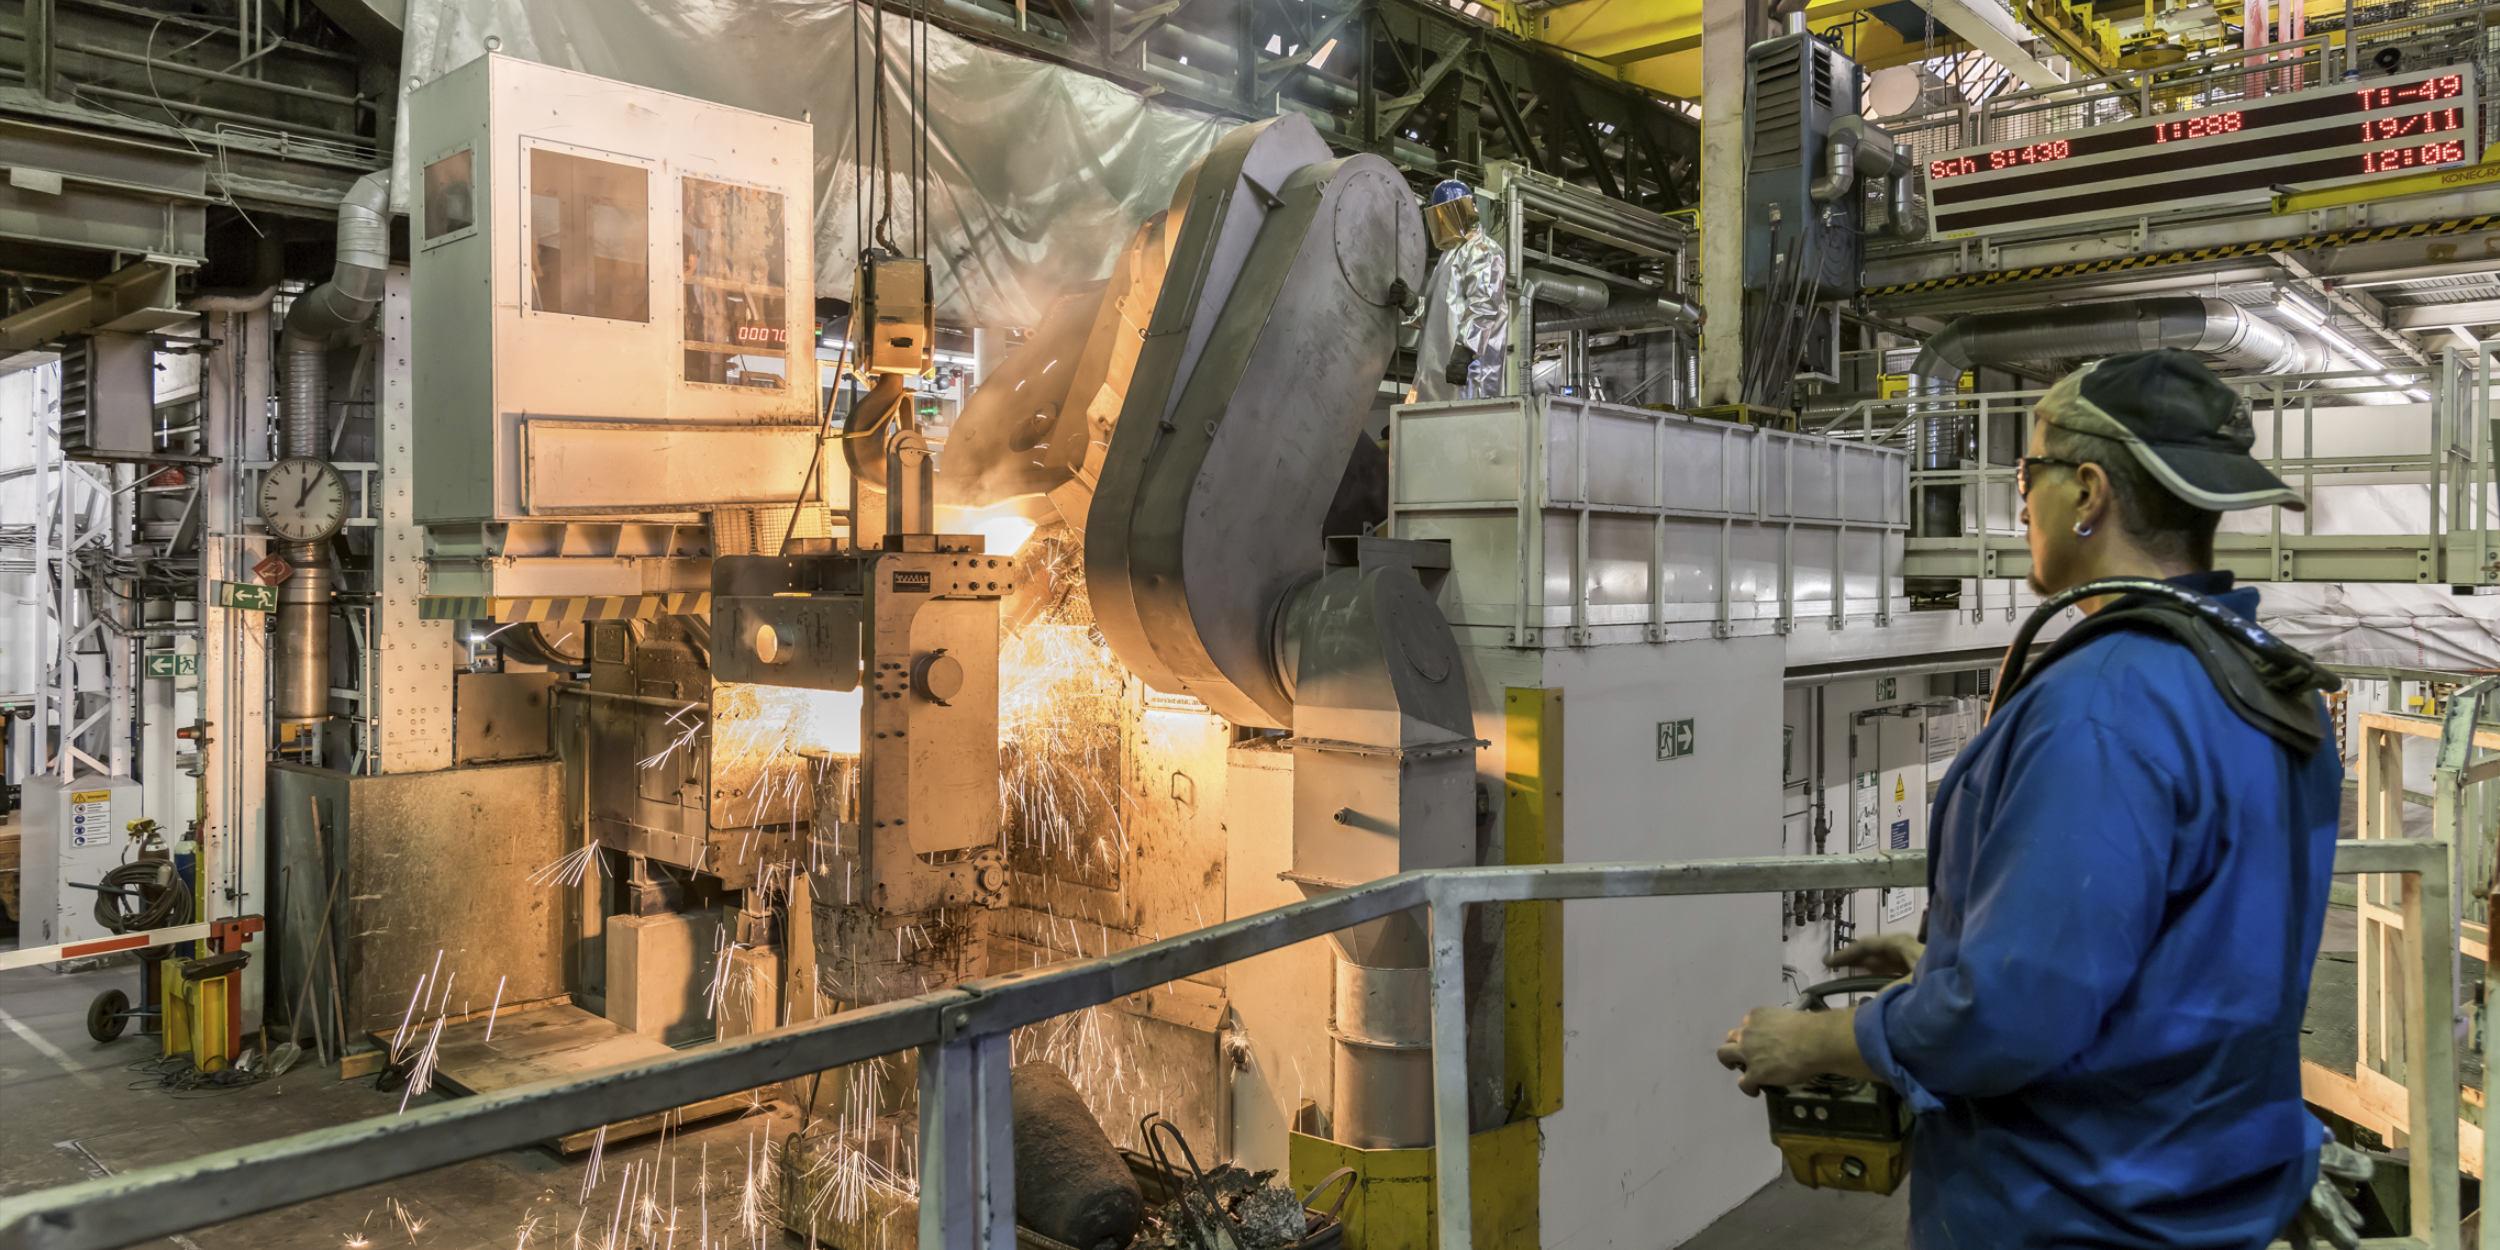 Industriefotografie Stuttgart und Umgebung Mercedes Benz Mettingen Rohstahl Rohmaterial Giesswerk Schwerkraftguss Schmiede